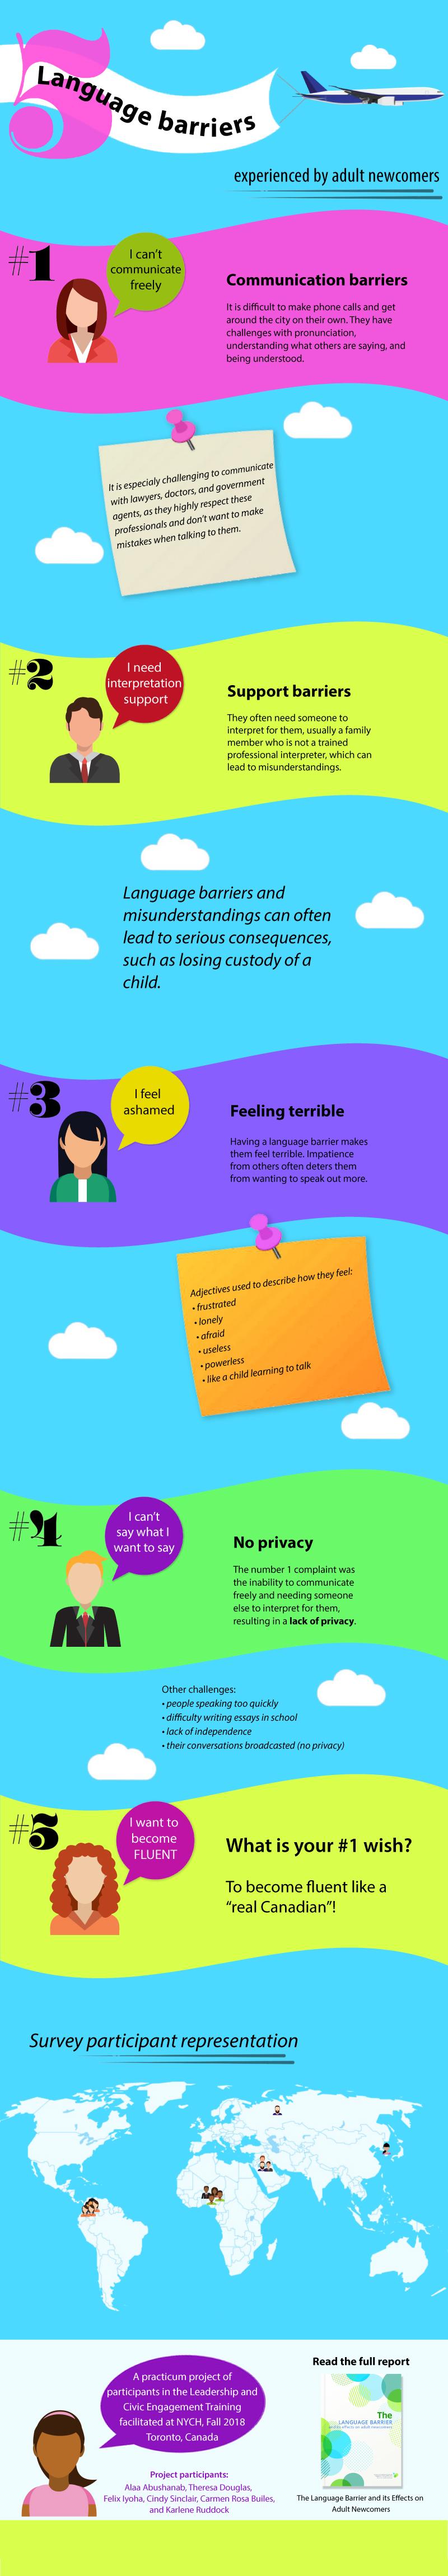 Language-Barrier-Infographic_Dec-18_POSTED-ONLINE.jpg